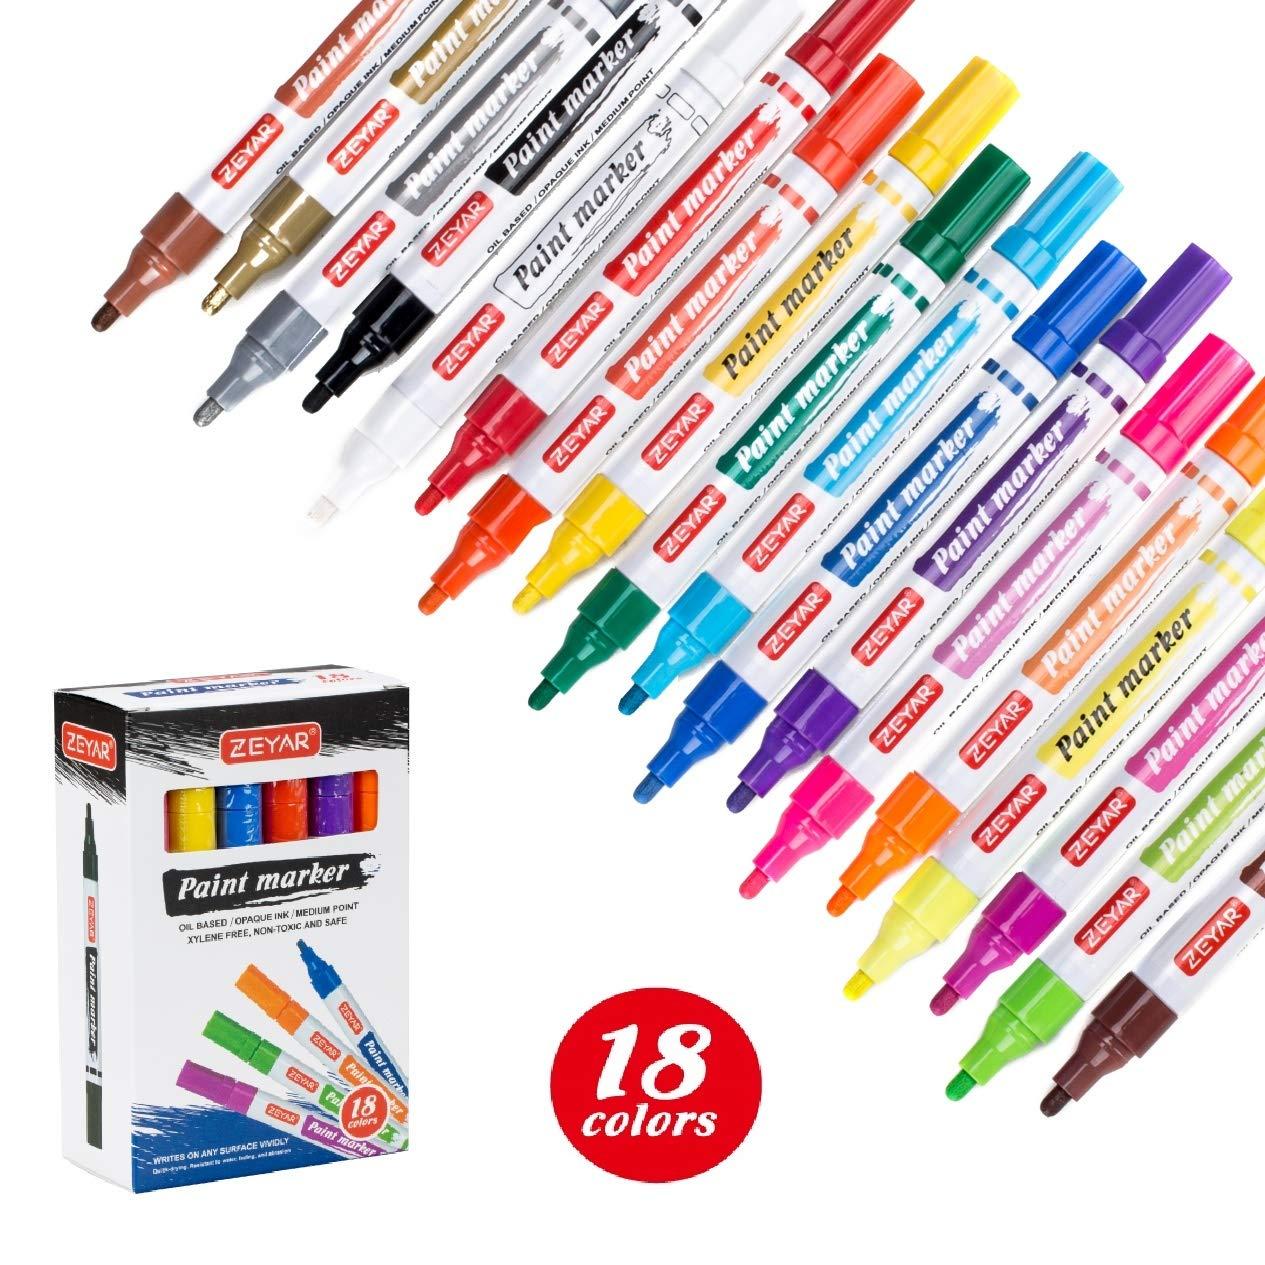 ZEYAR Paint Pens, 18 Colors, Medium Point, Permanent & Waterproof ink, Expert of Rock Painting, Oil-Based, Great on Mug, Rock, Glass, Canvas, Metal ...